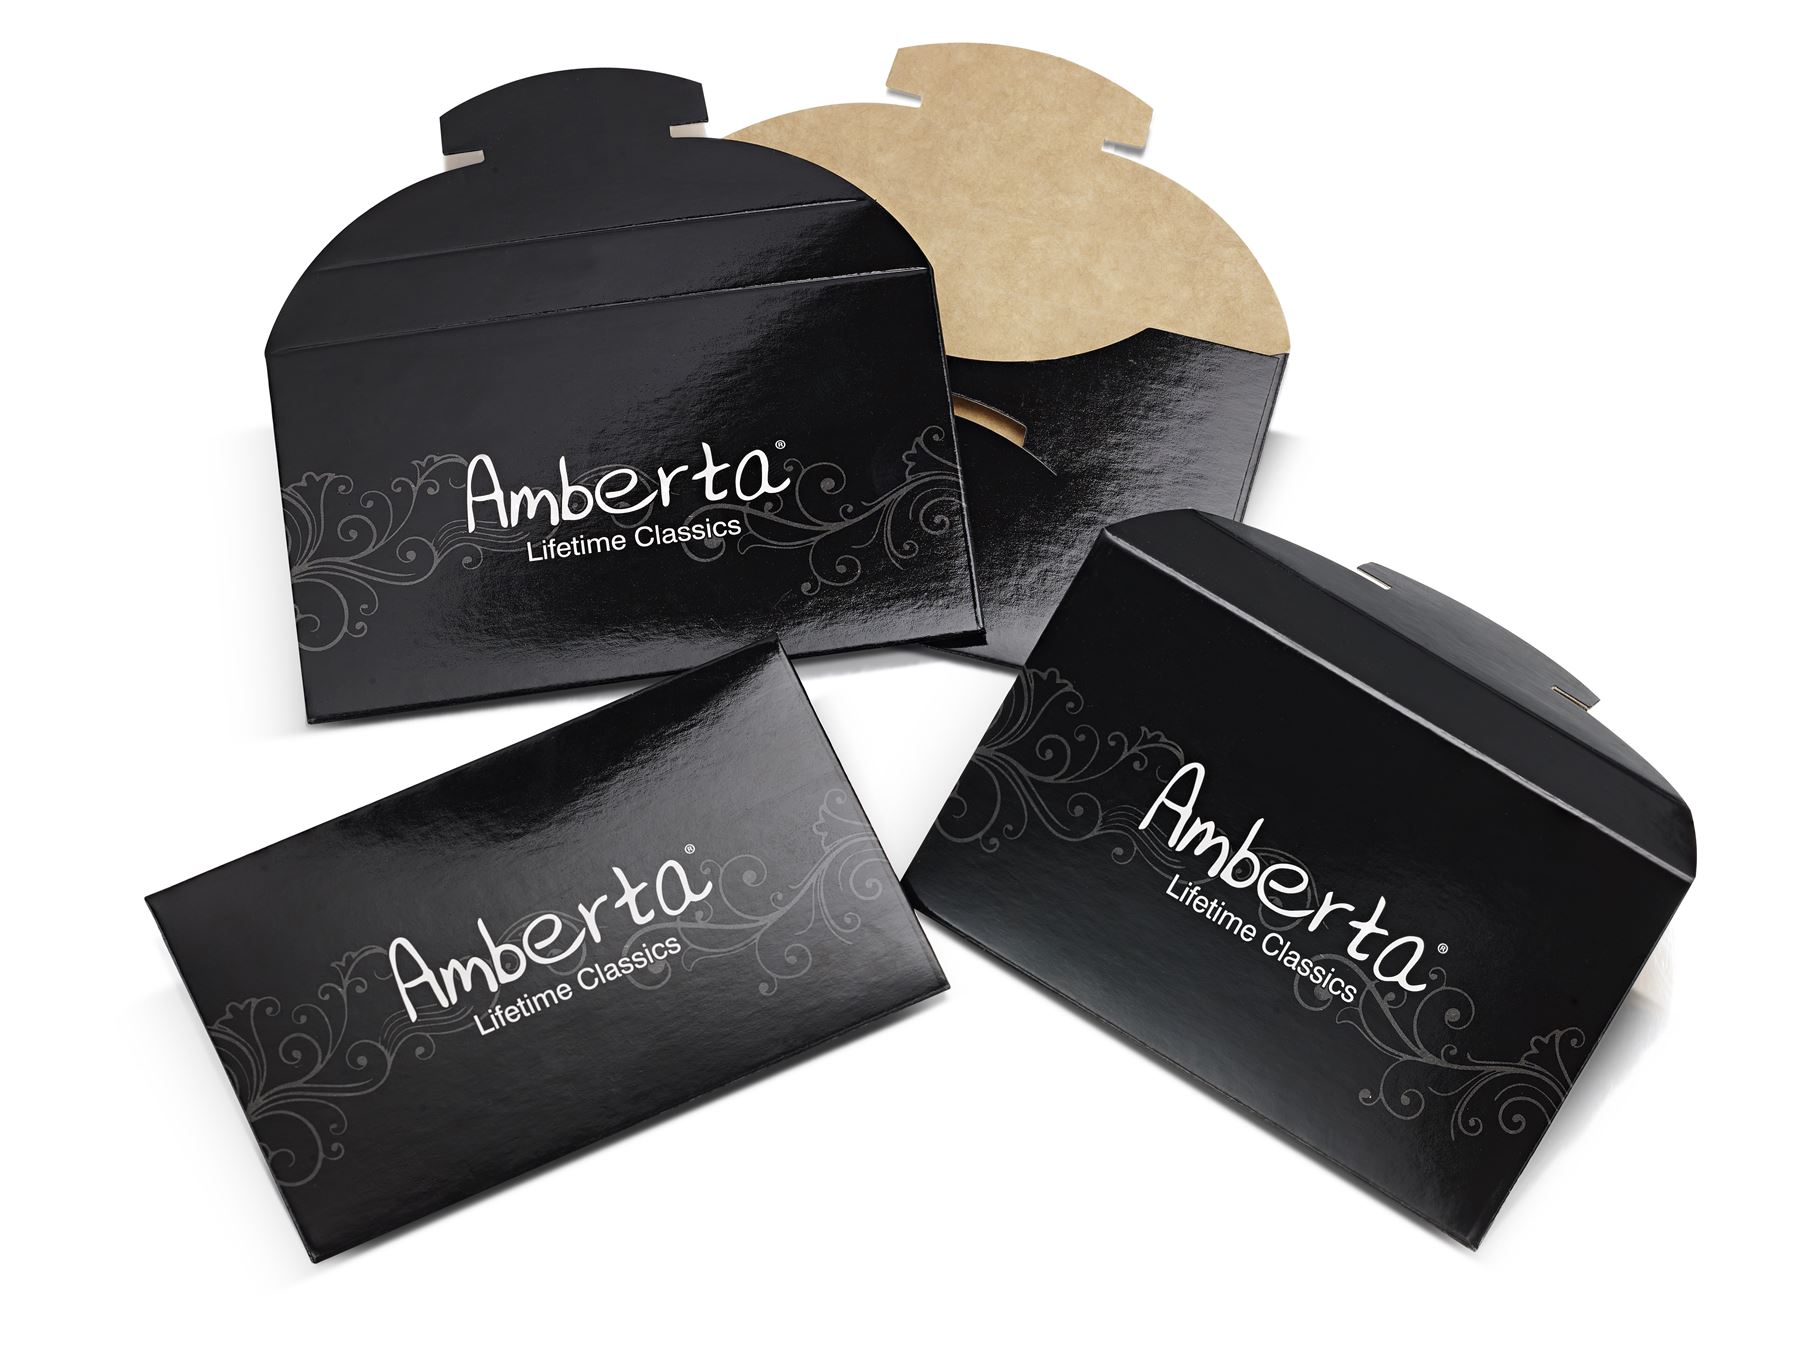 Amberta-Jewelry-925-Sterling-Silver-Adjustable-Bracelet-Italian-Bangle-for-Women thumbnail 73